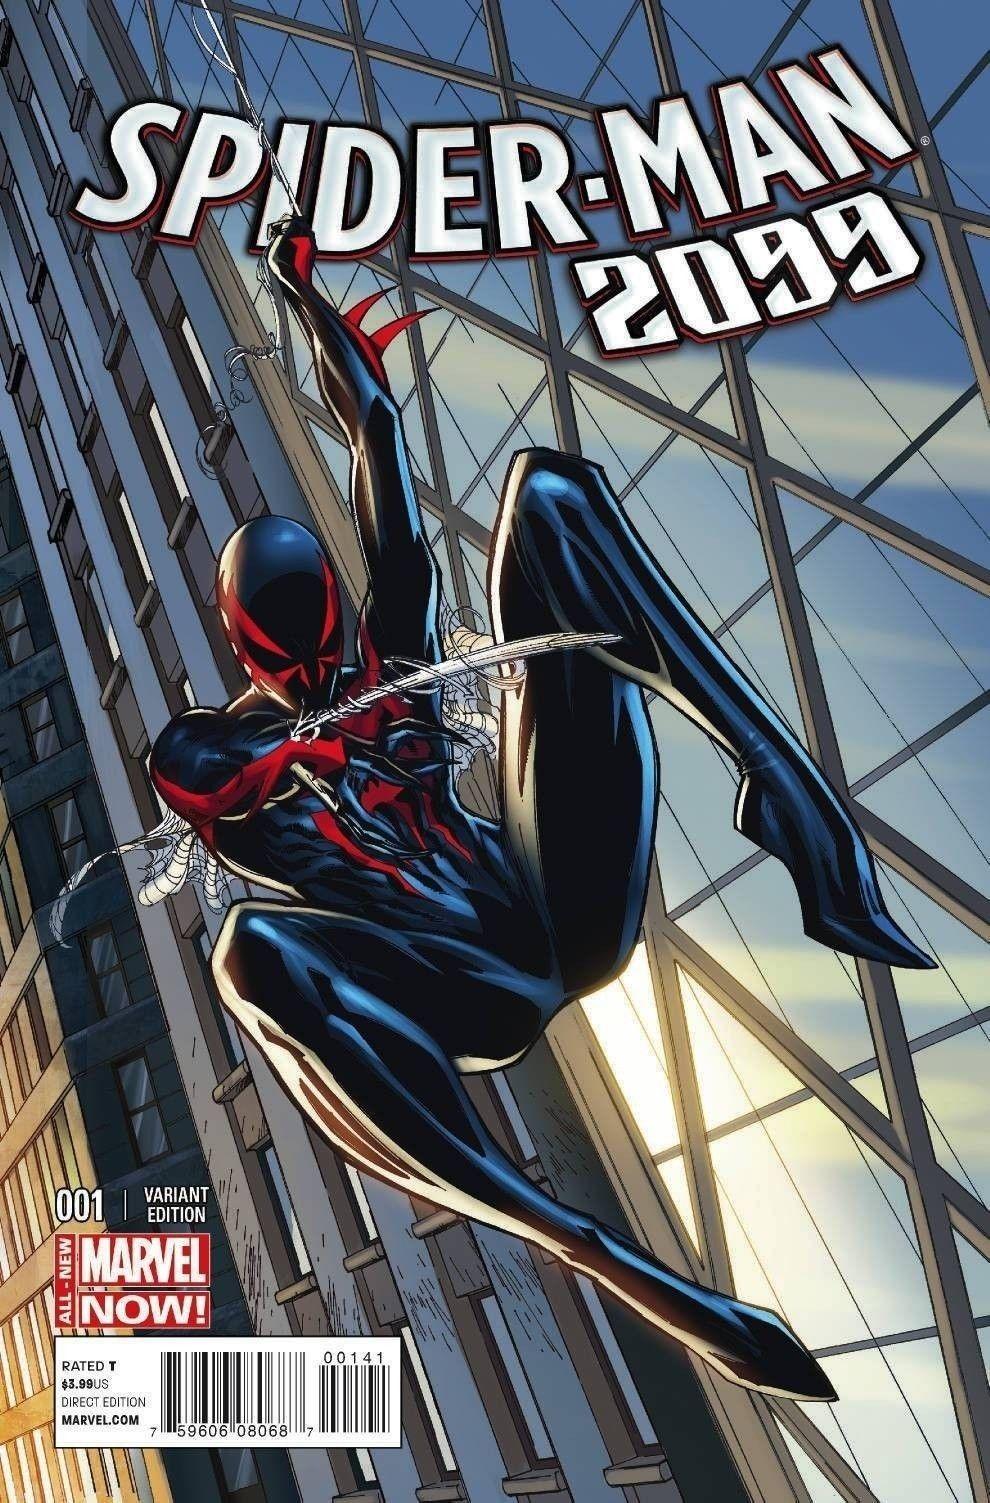 Spider-man 2099 Volume 2 #1 J. Scott Campbell Variant